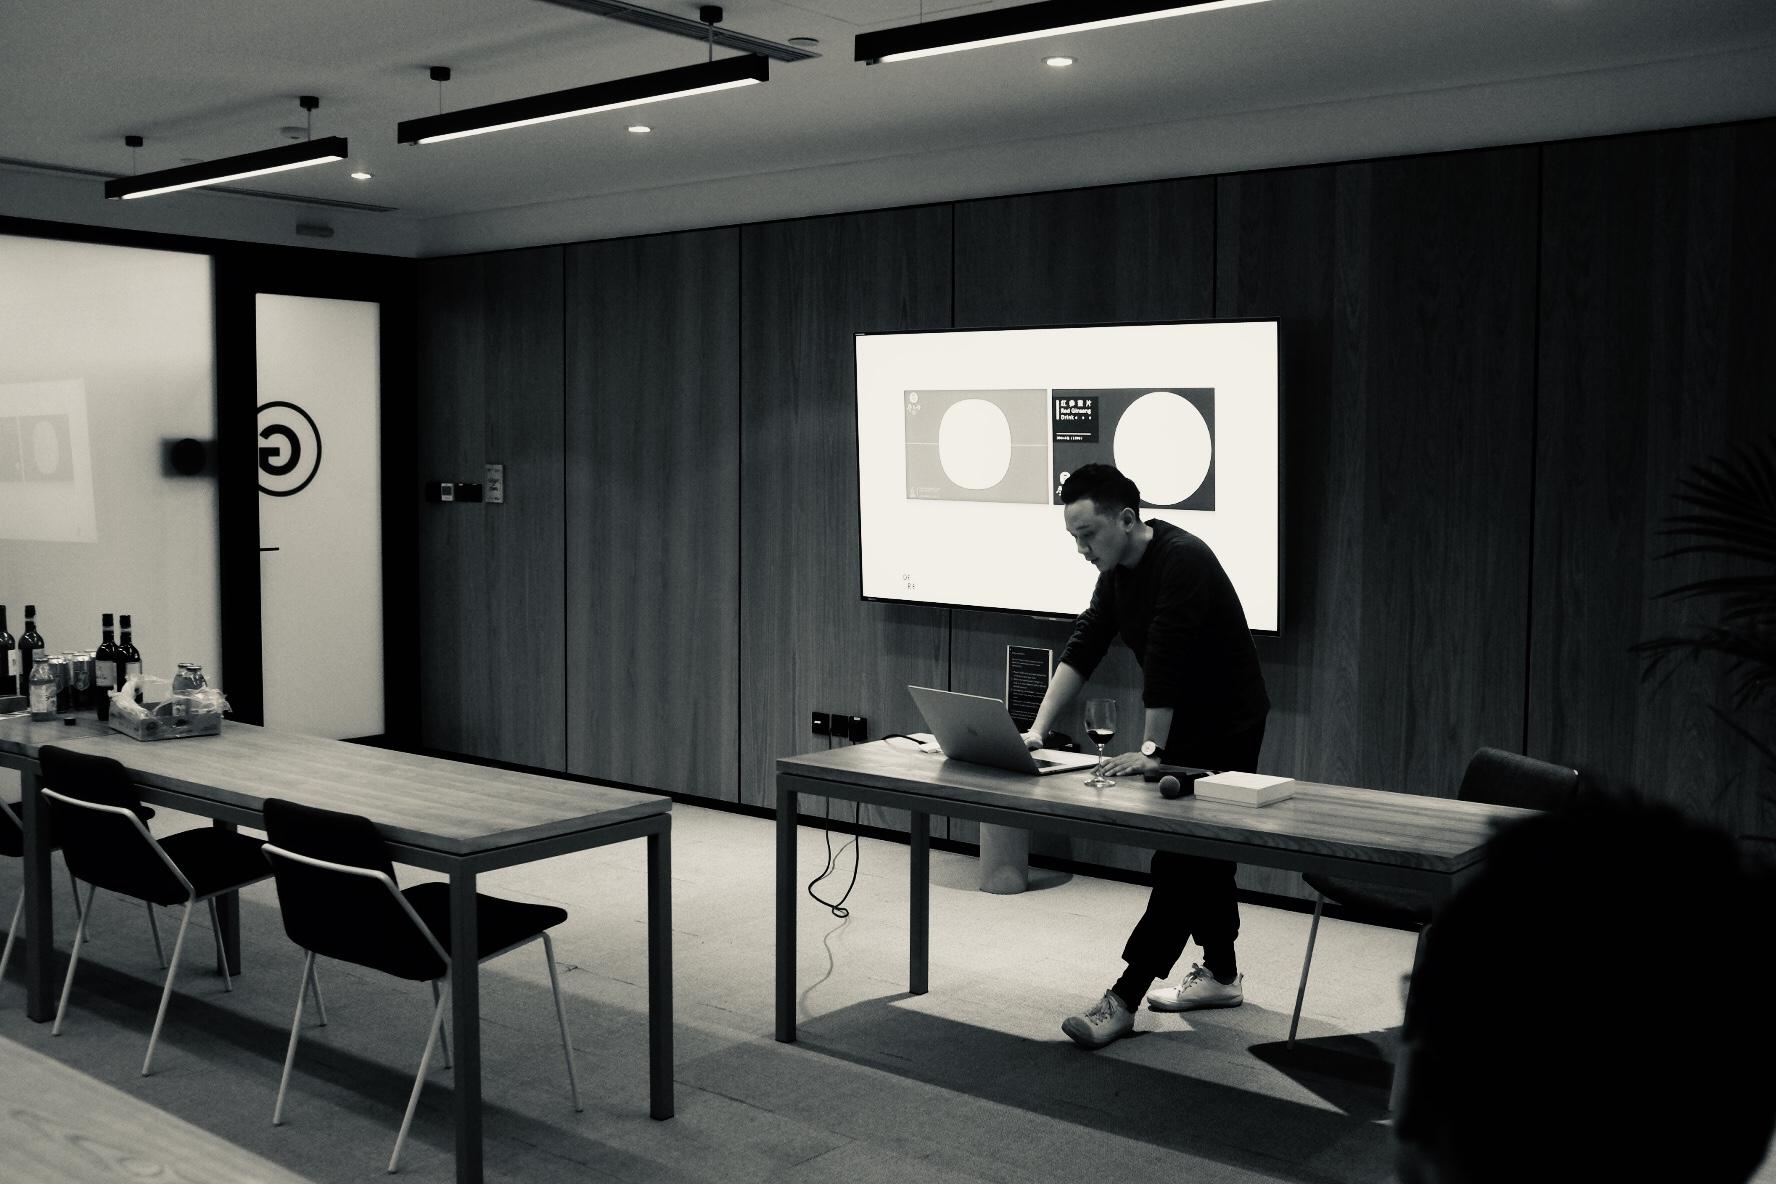 Dere Lab视觉设计咨询机构